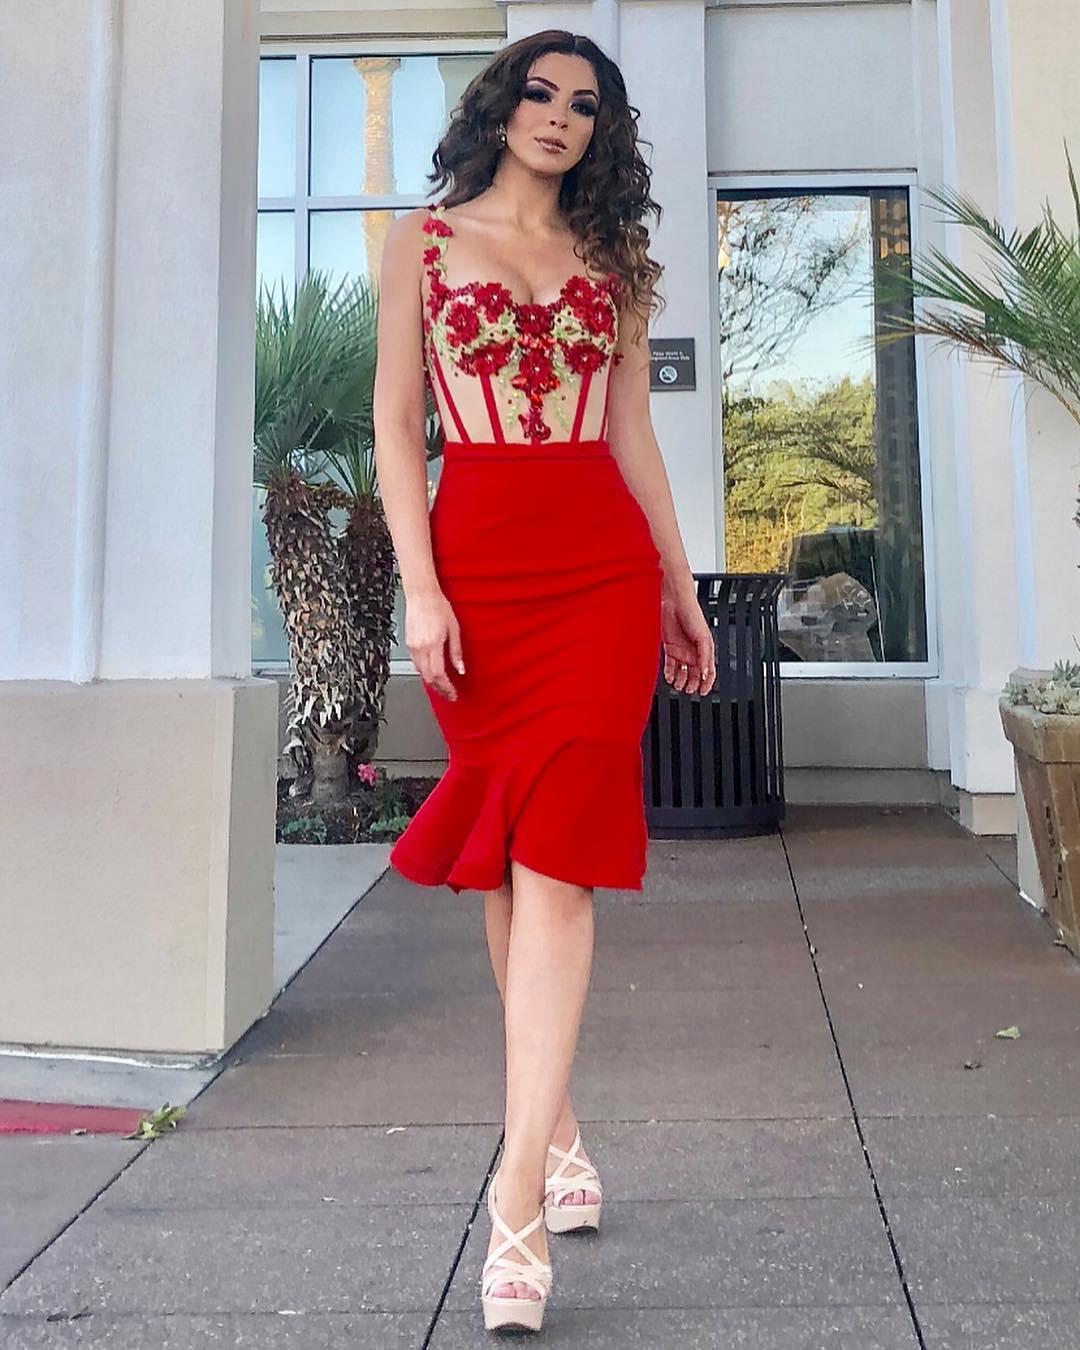 itzel paola astudillo, miss chiapas 2020 para miss mexico 2021/primera finalista de miss panamerican international 2018/top 16 de miss earth 2016. - Página 6 42966910